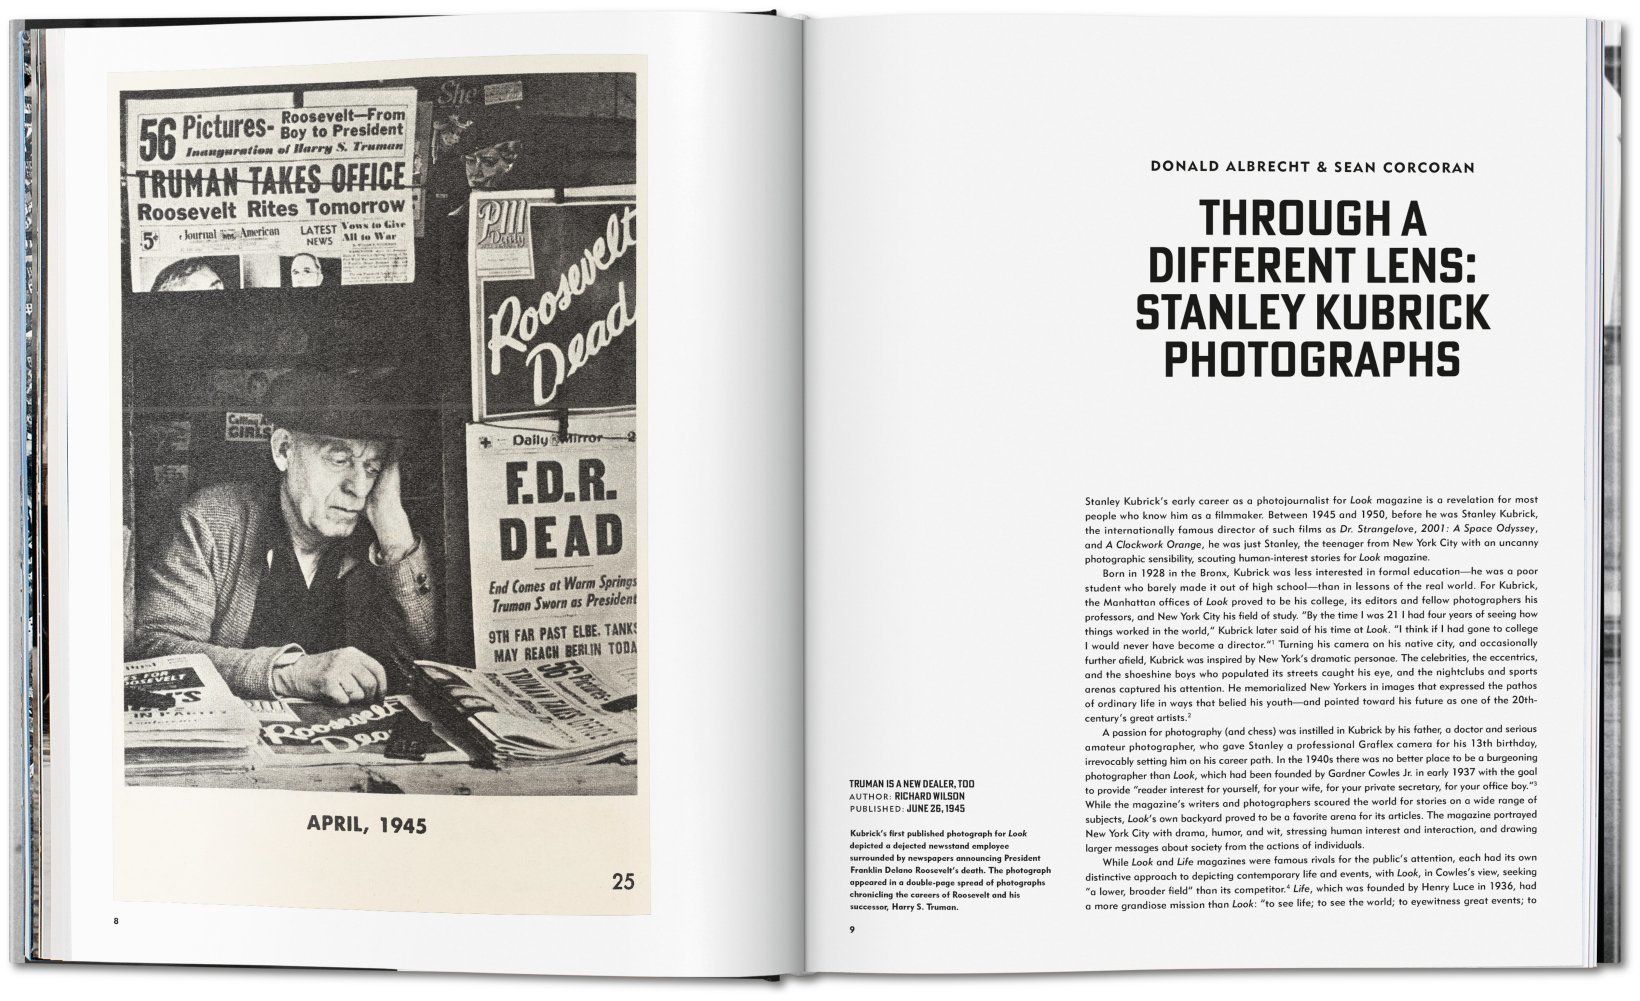 Stanley Kubrick Photographs 2